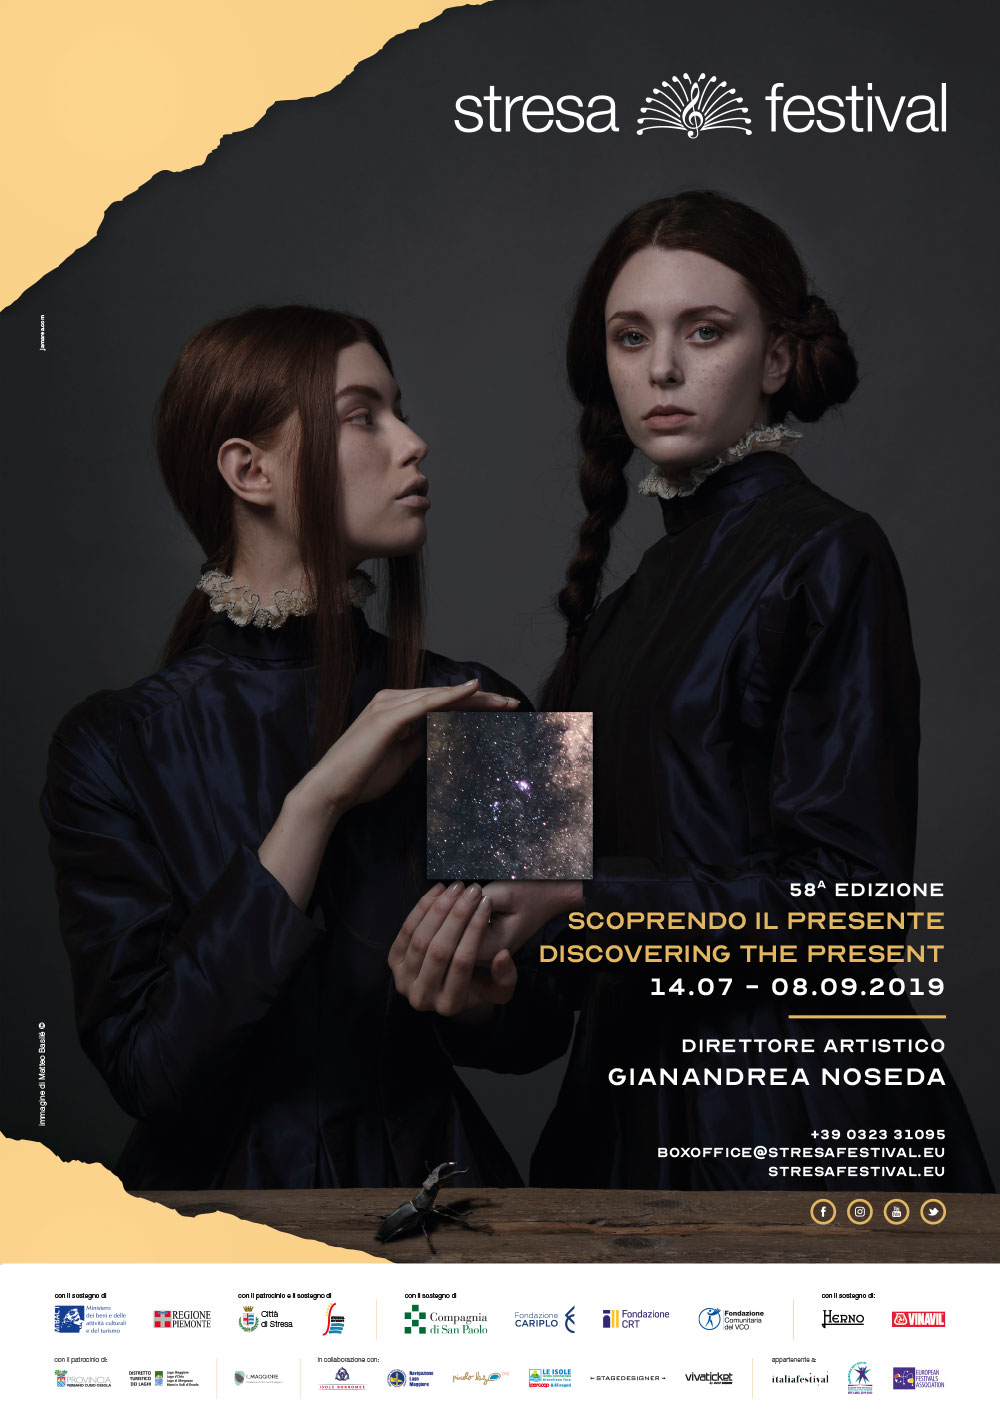 Stresa-Festival-locandina-2019